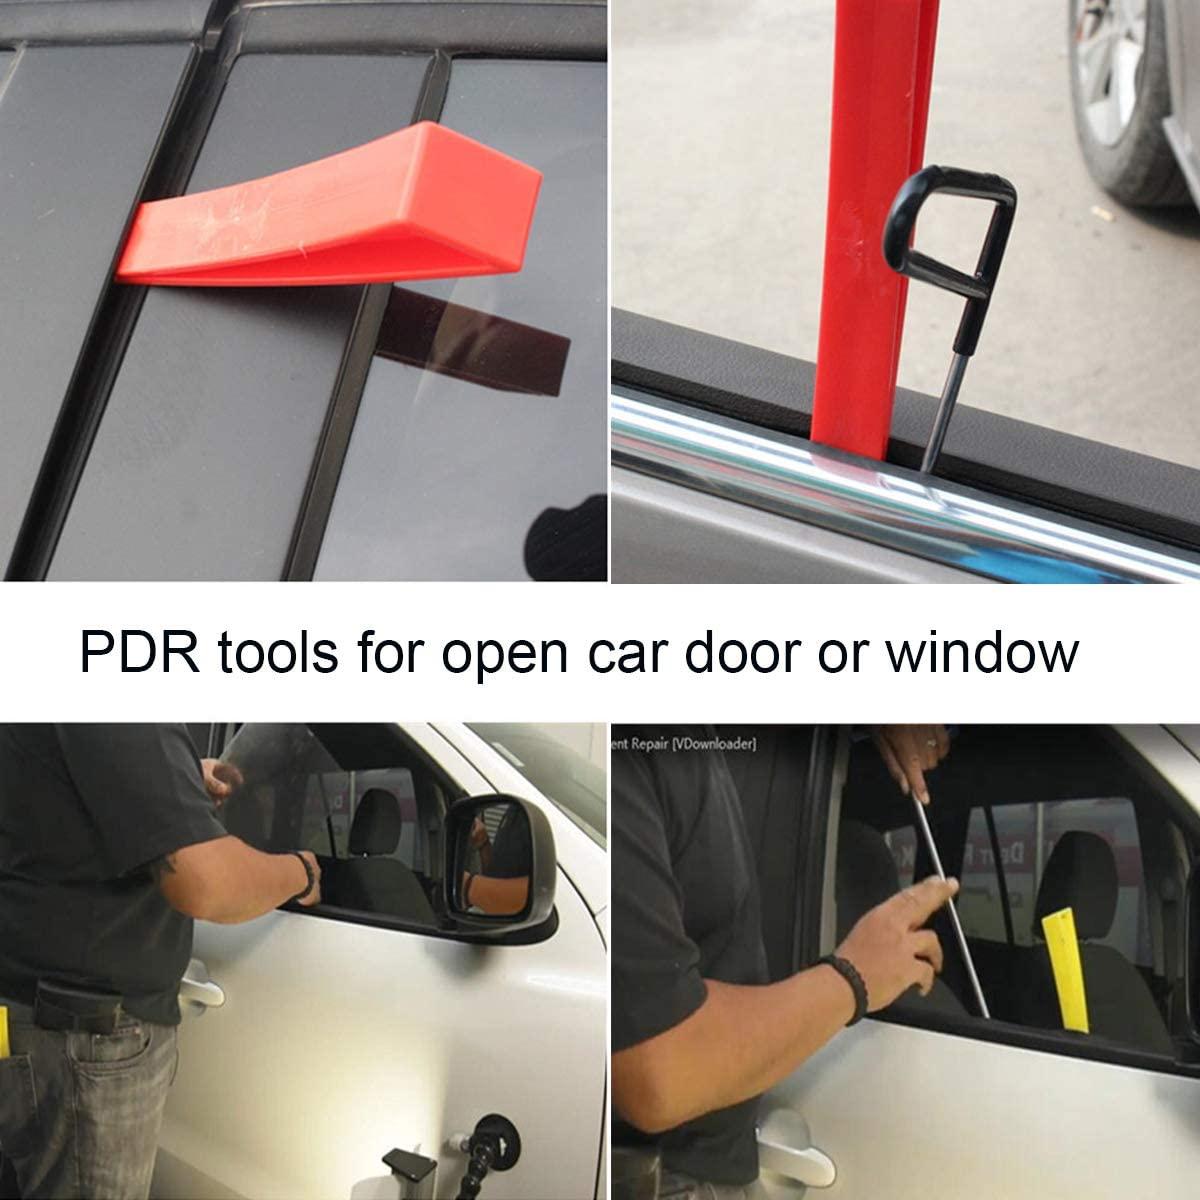 Curved Window Wedge Paintless Dent Repair Tools Door Wedge Tool for Repair Auto Car Body DIY Hand Tools  - buy with discount